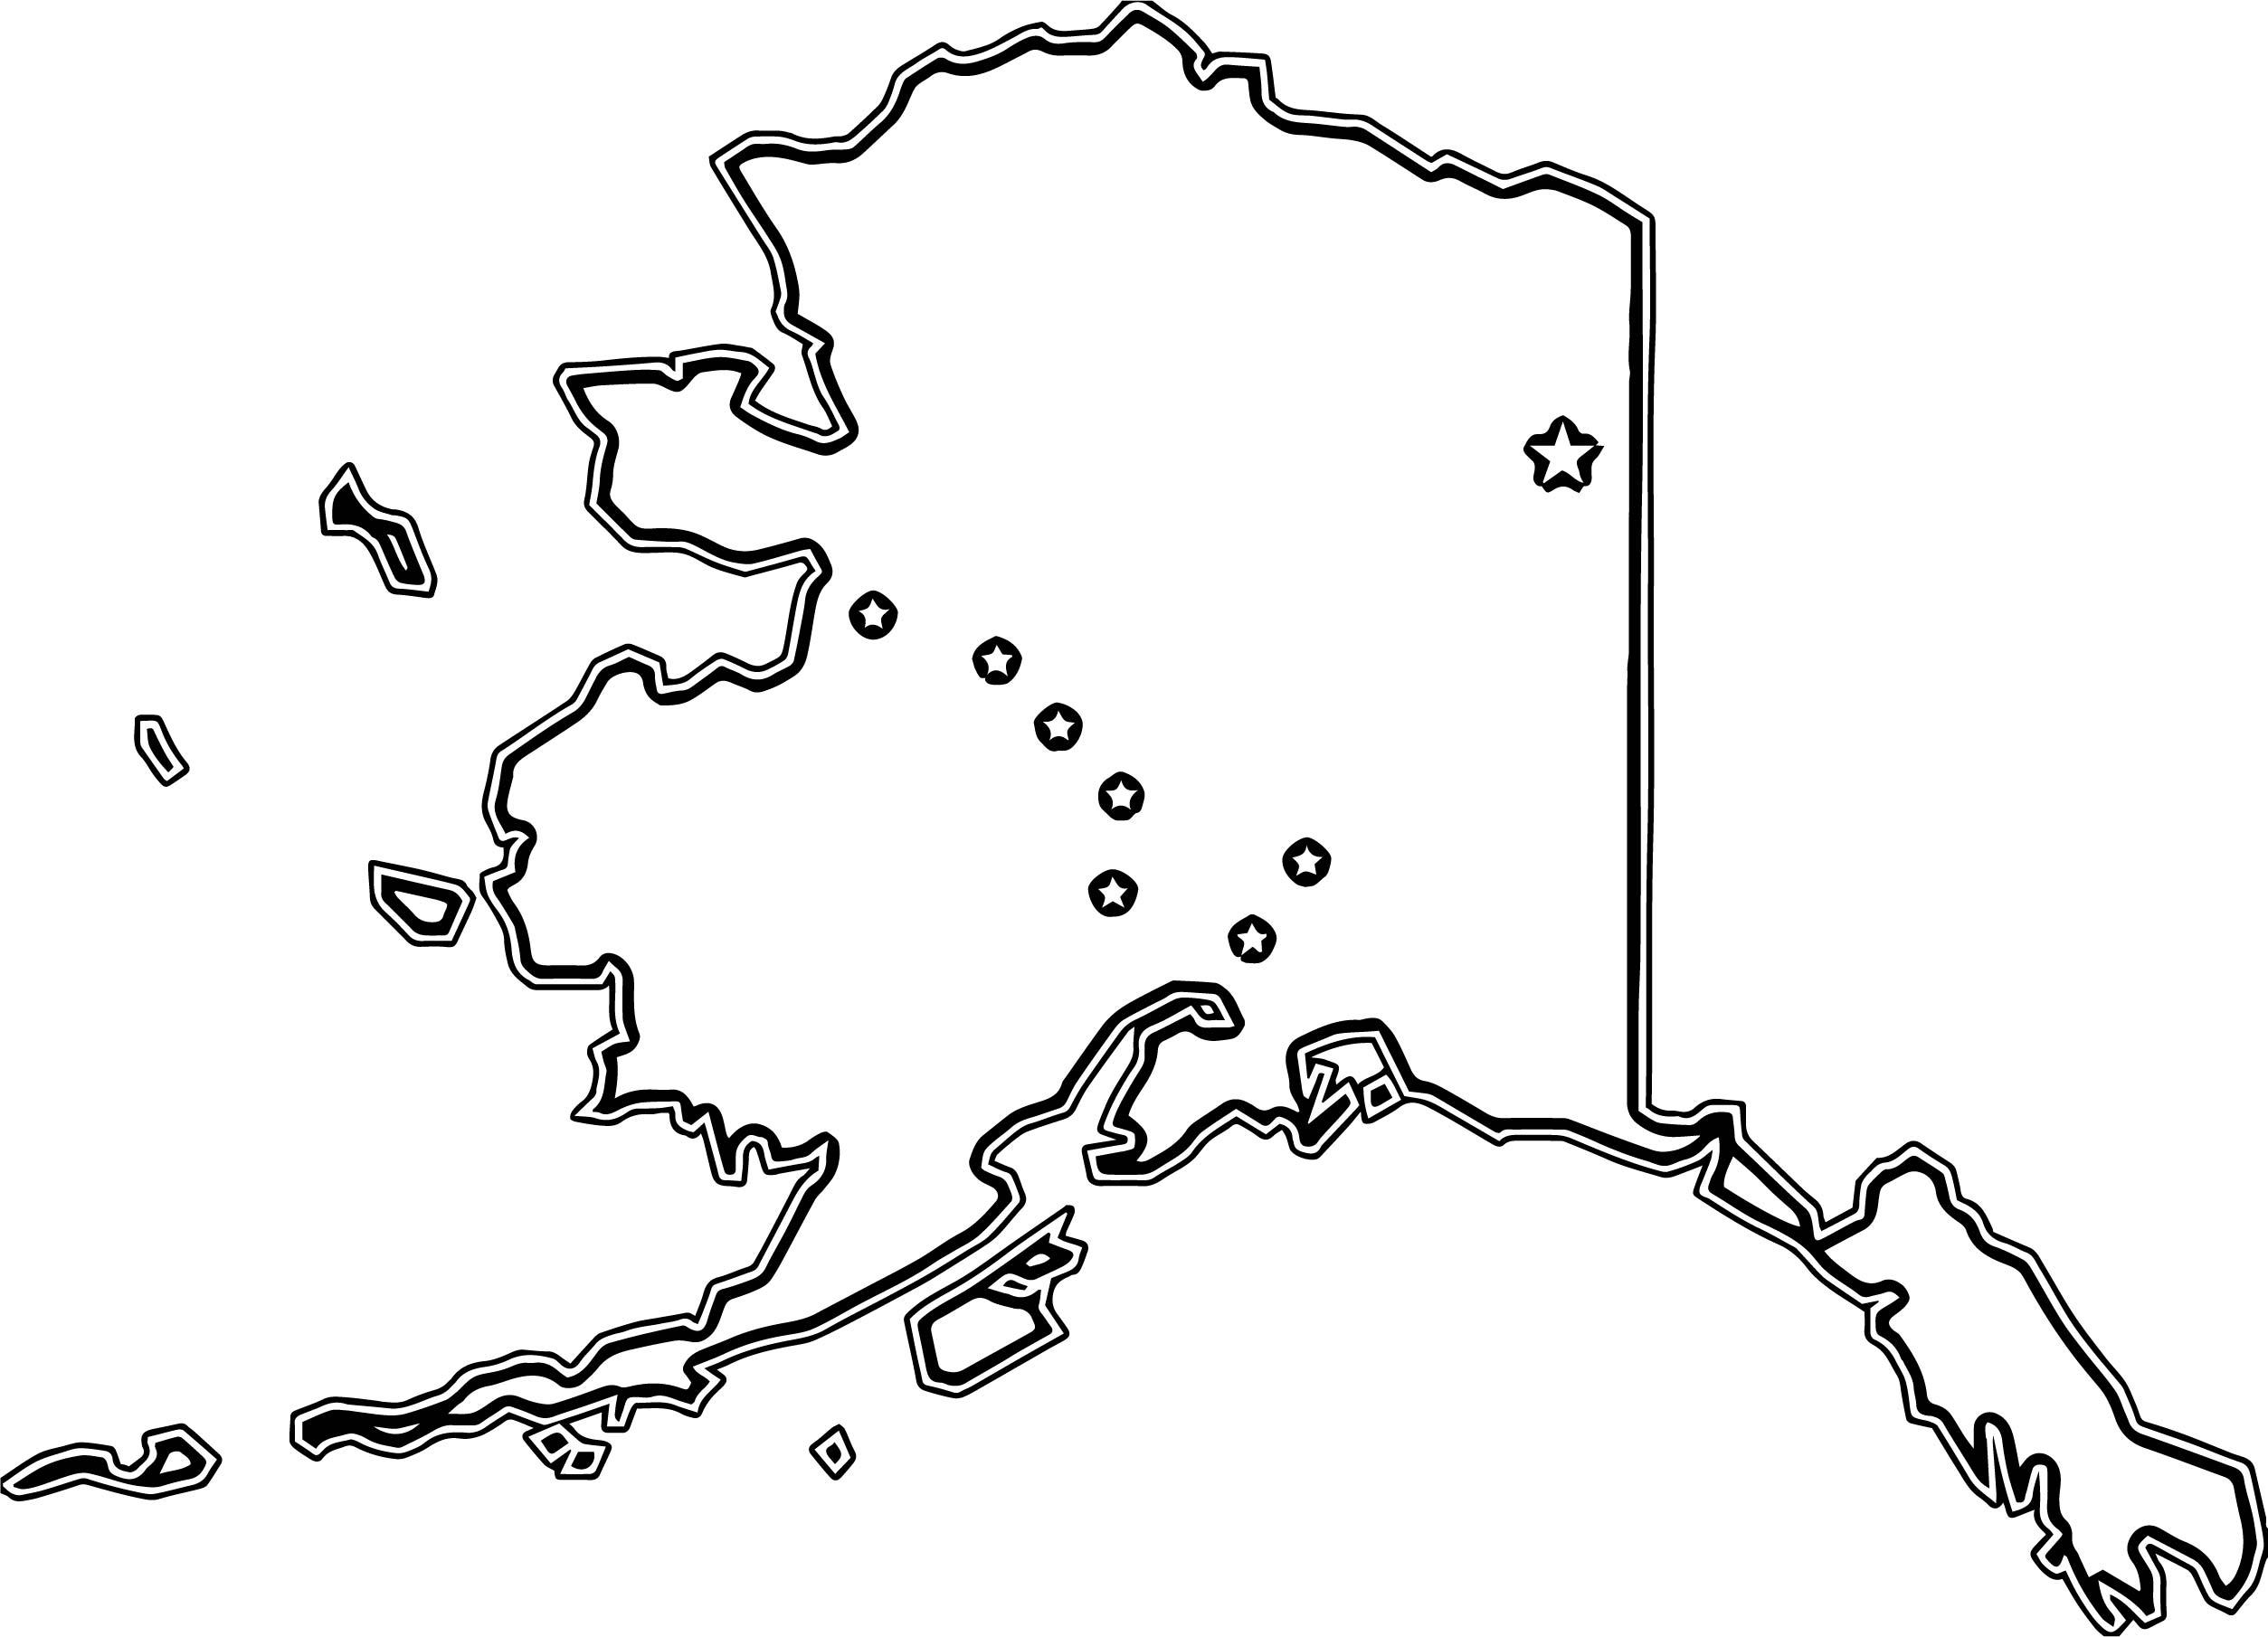 alaska flag coloring page alaska state symbols coloring page free printable page flag coloring alaska